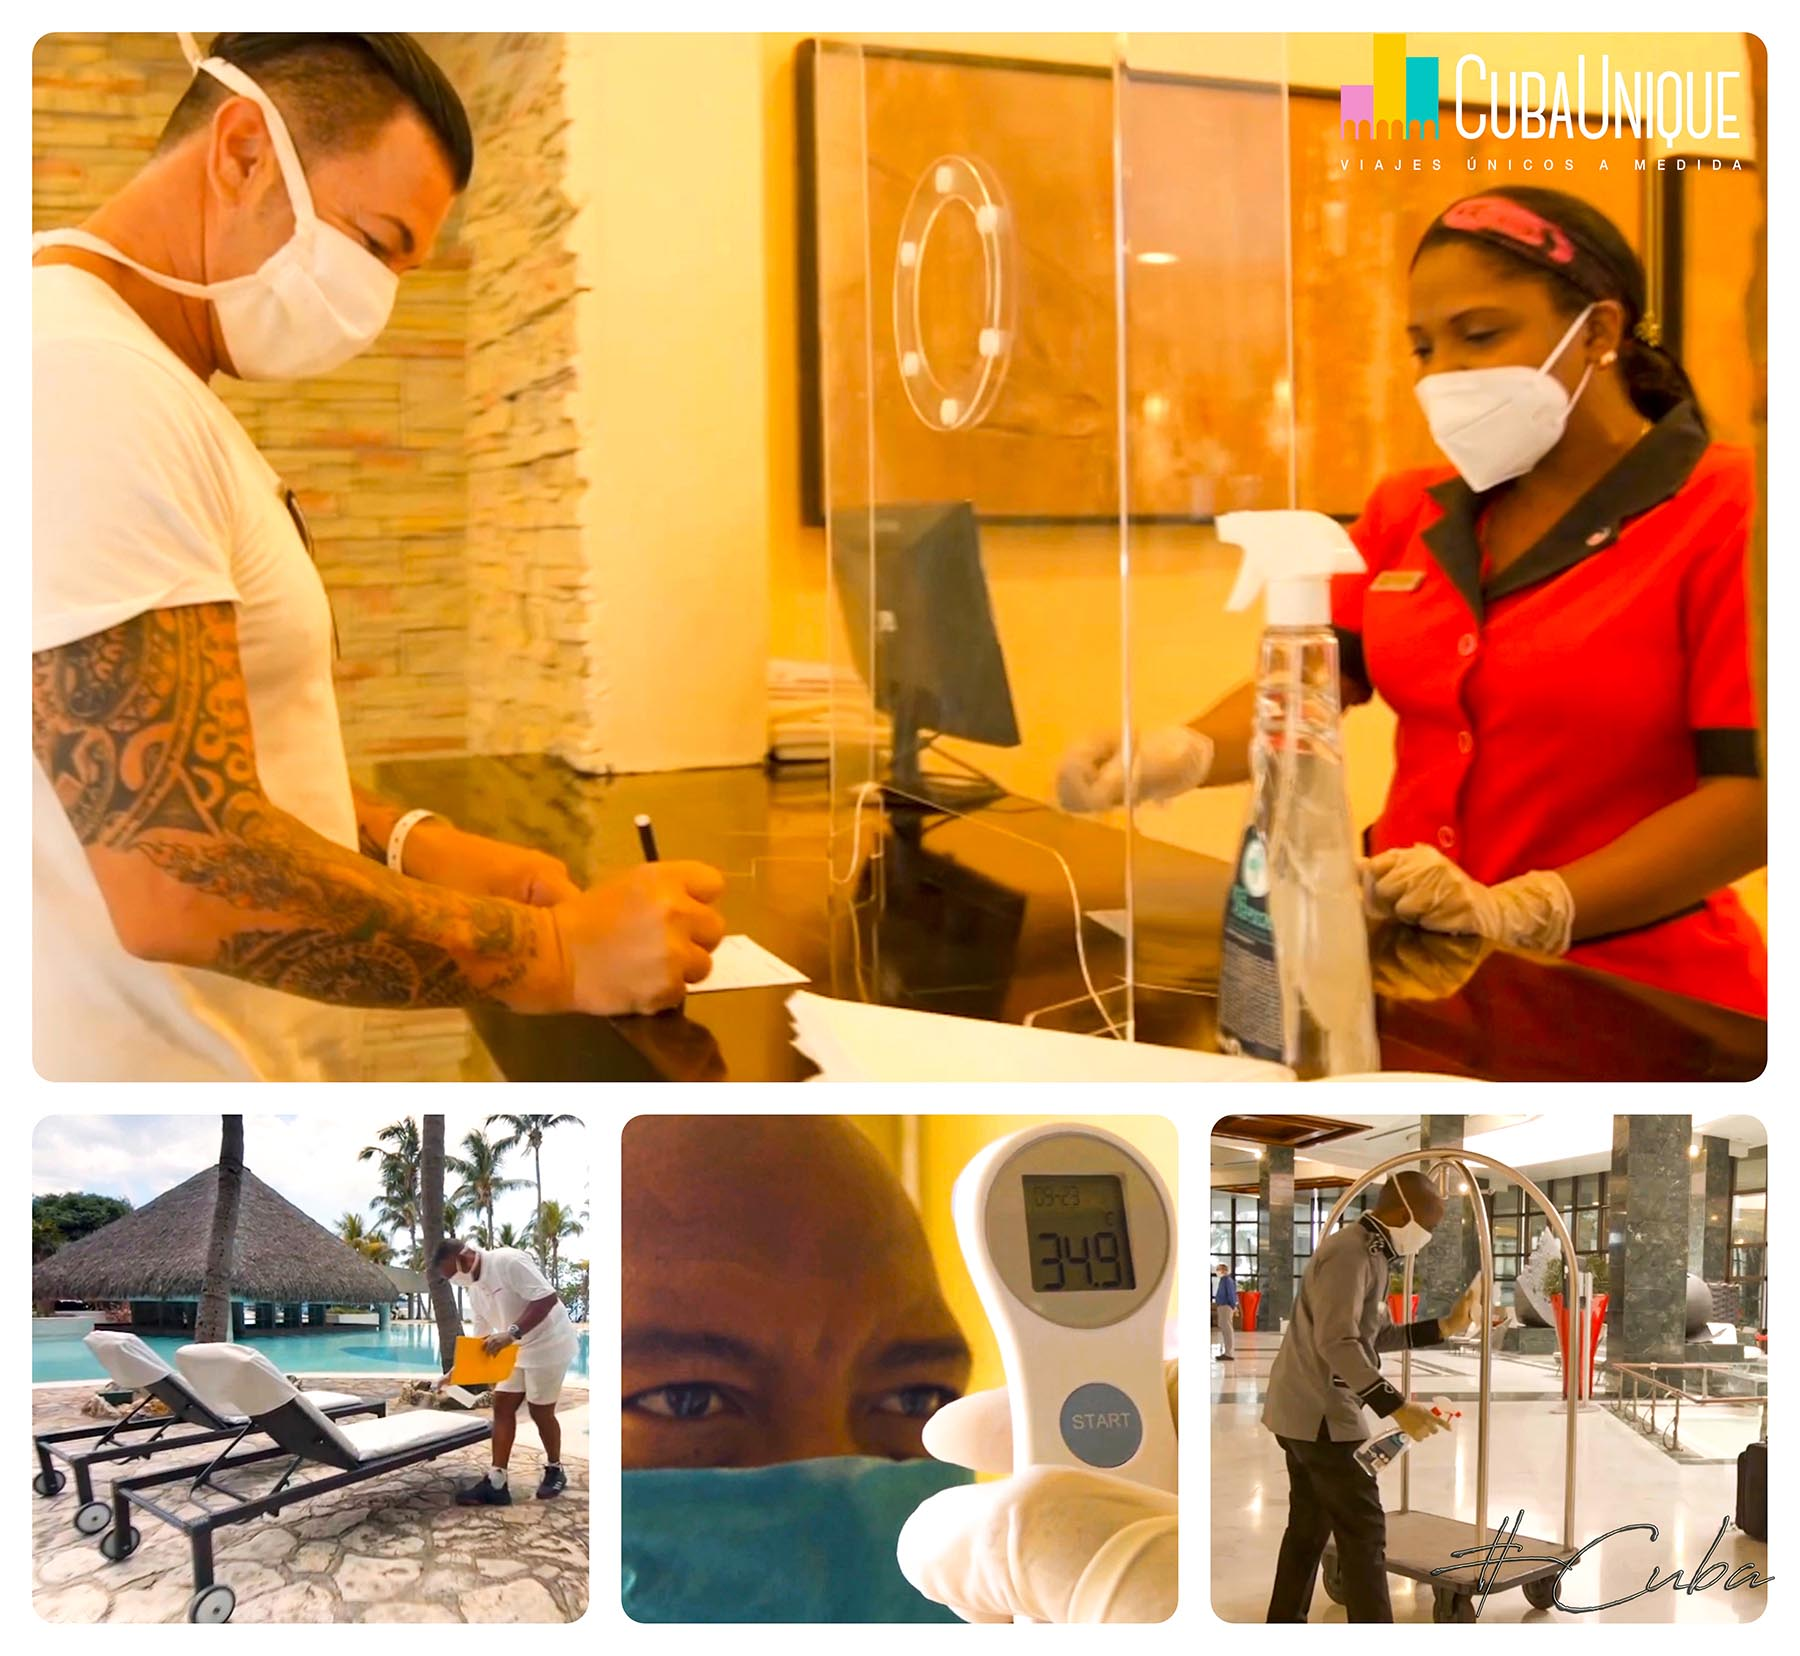 Medidas actuación Coronavirus en Cuba